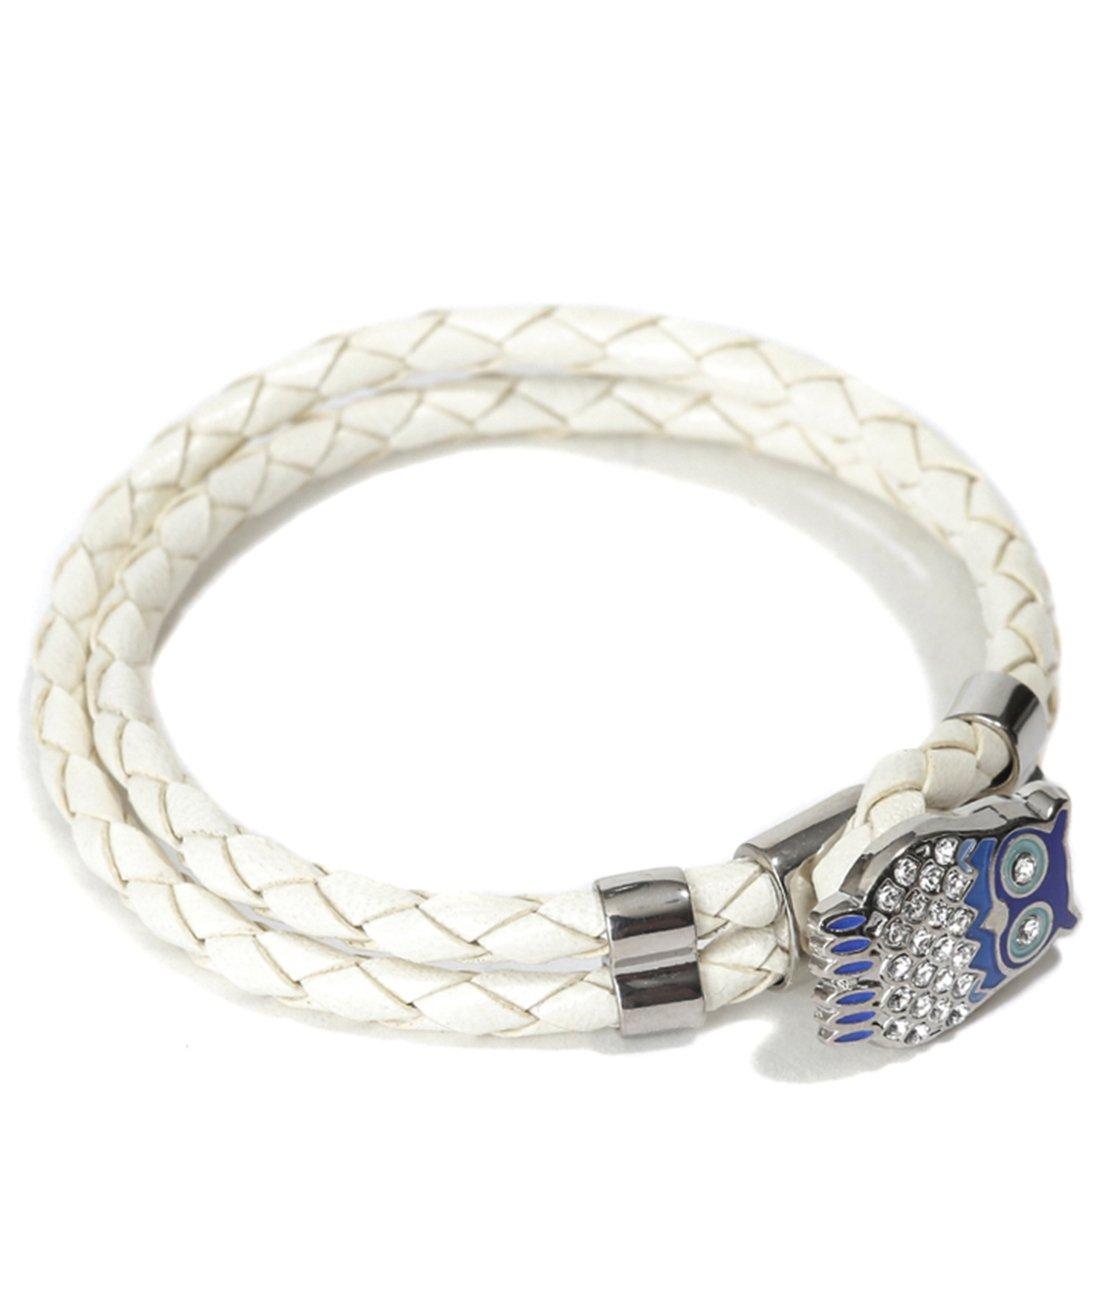 Mon Art Women's Braided Bracelet with Embellished Blue Owl Toggle L Ivory